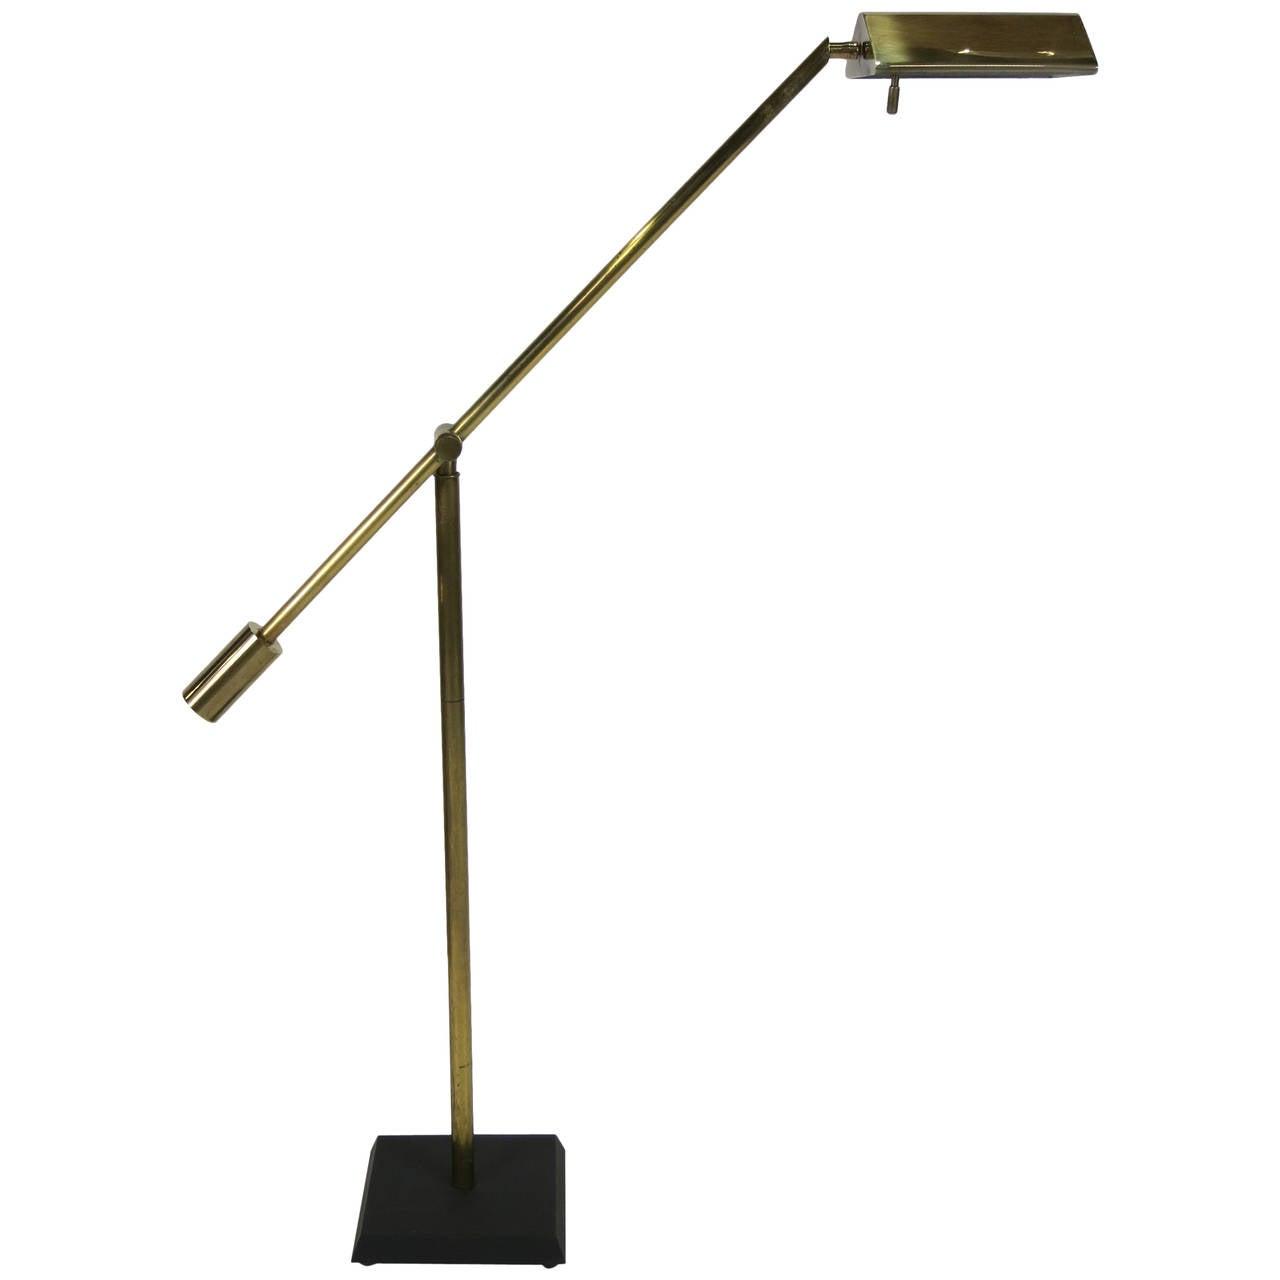 Fine Brass Swing Arm Pharmacy Lamp by Frederick Cooper